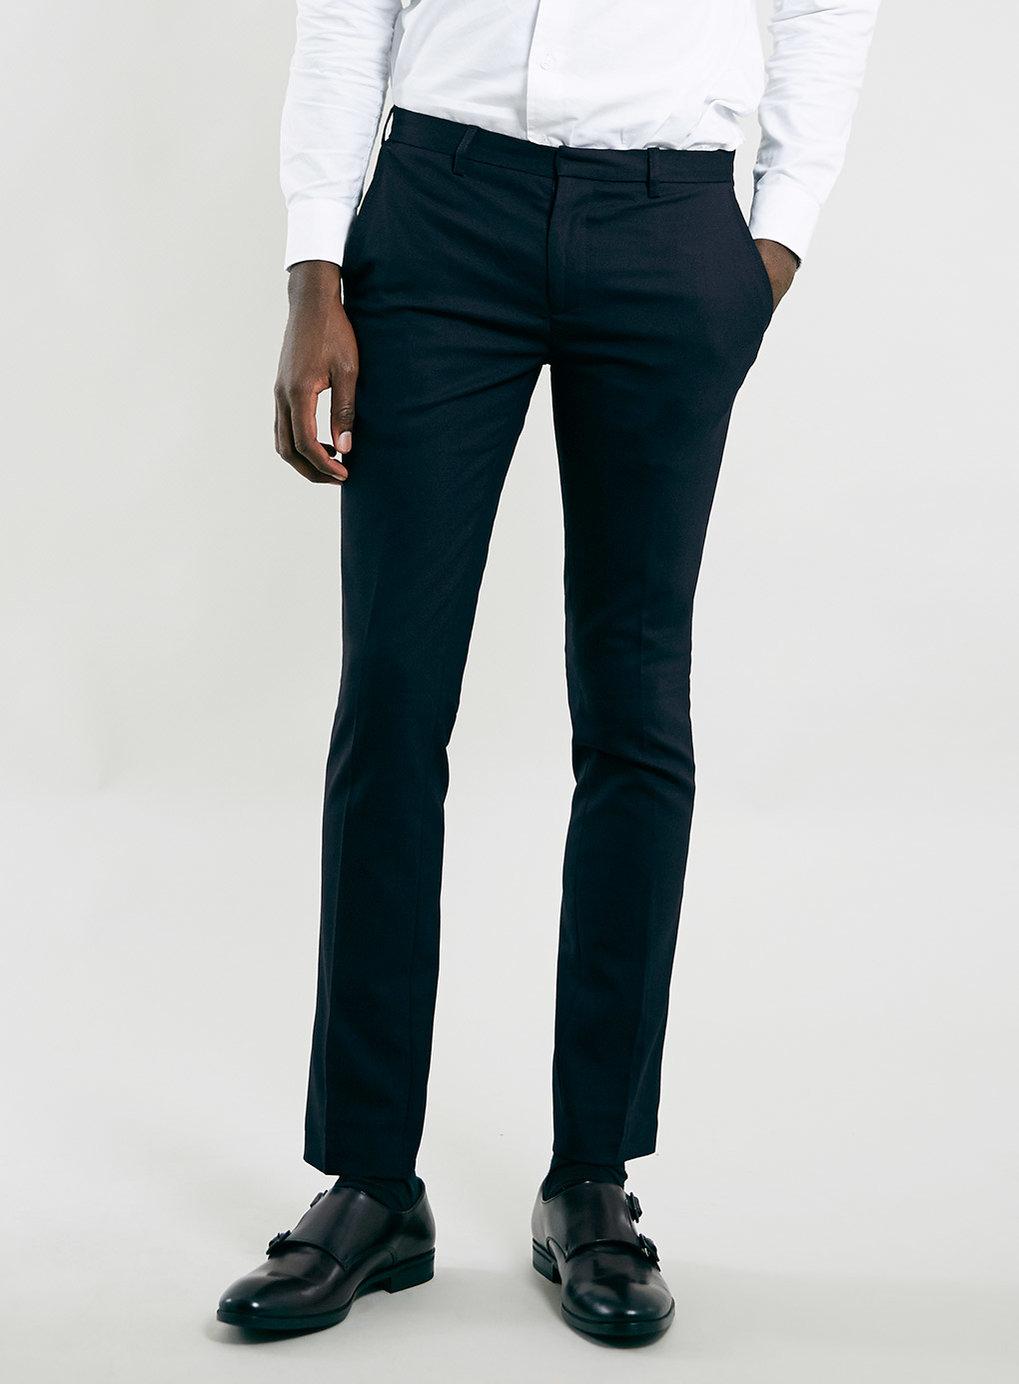 Amazing Low Rise Slim Leg Columnist Pant 6990